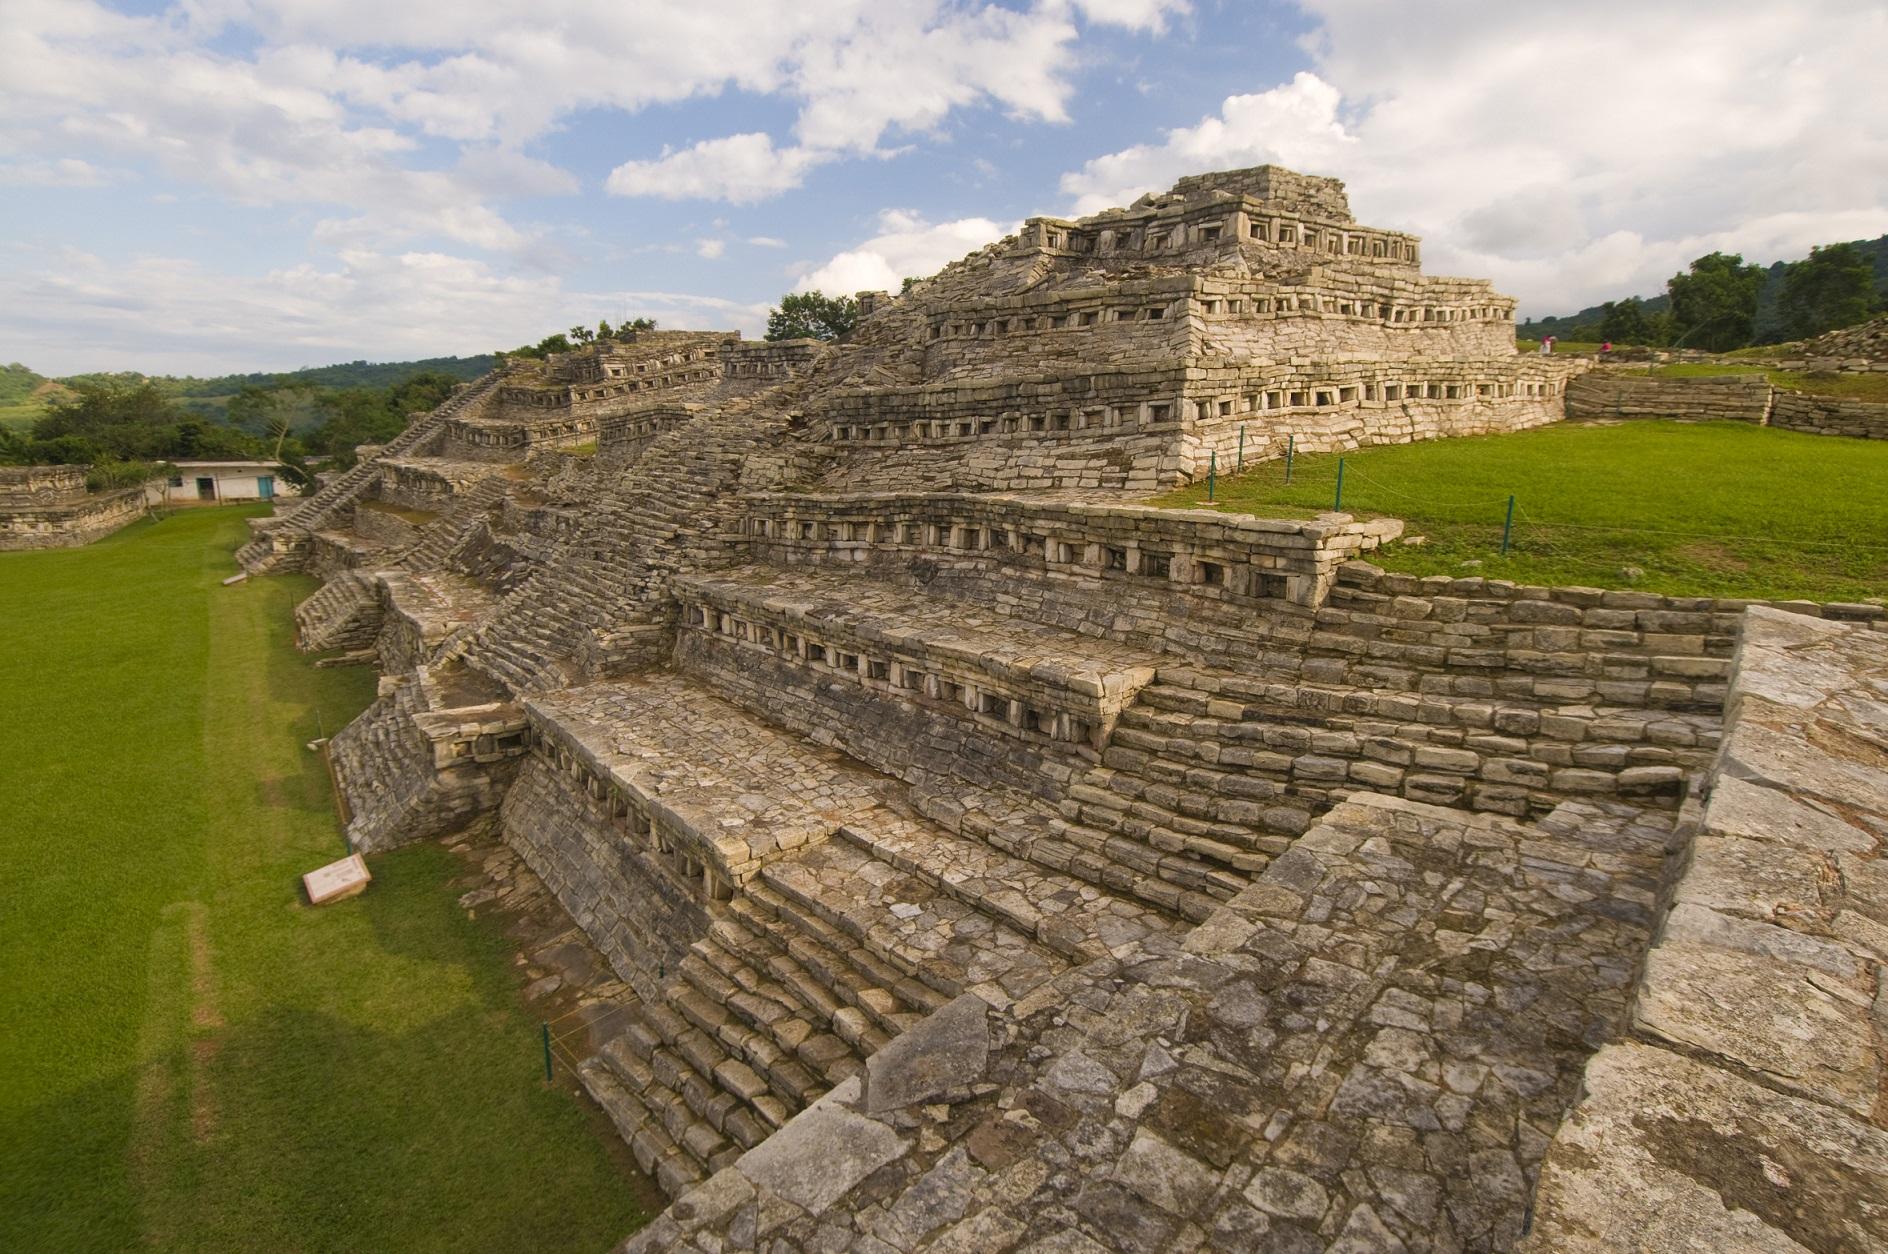 /cms/uploads/image/file/270900/Yohualichan-Puebla.jpg